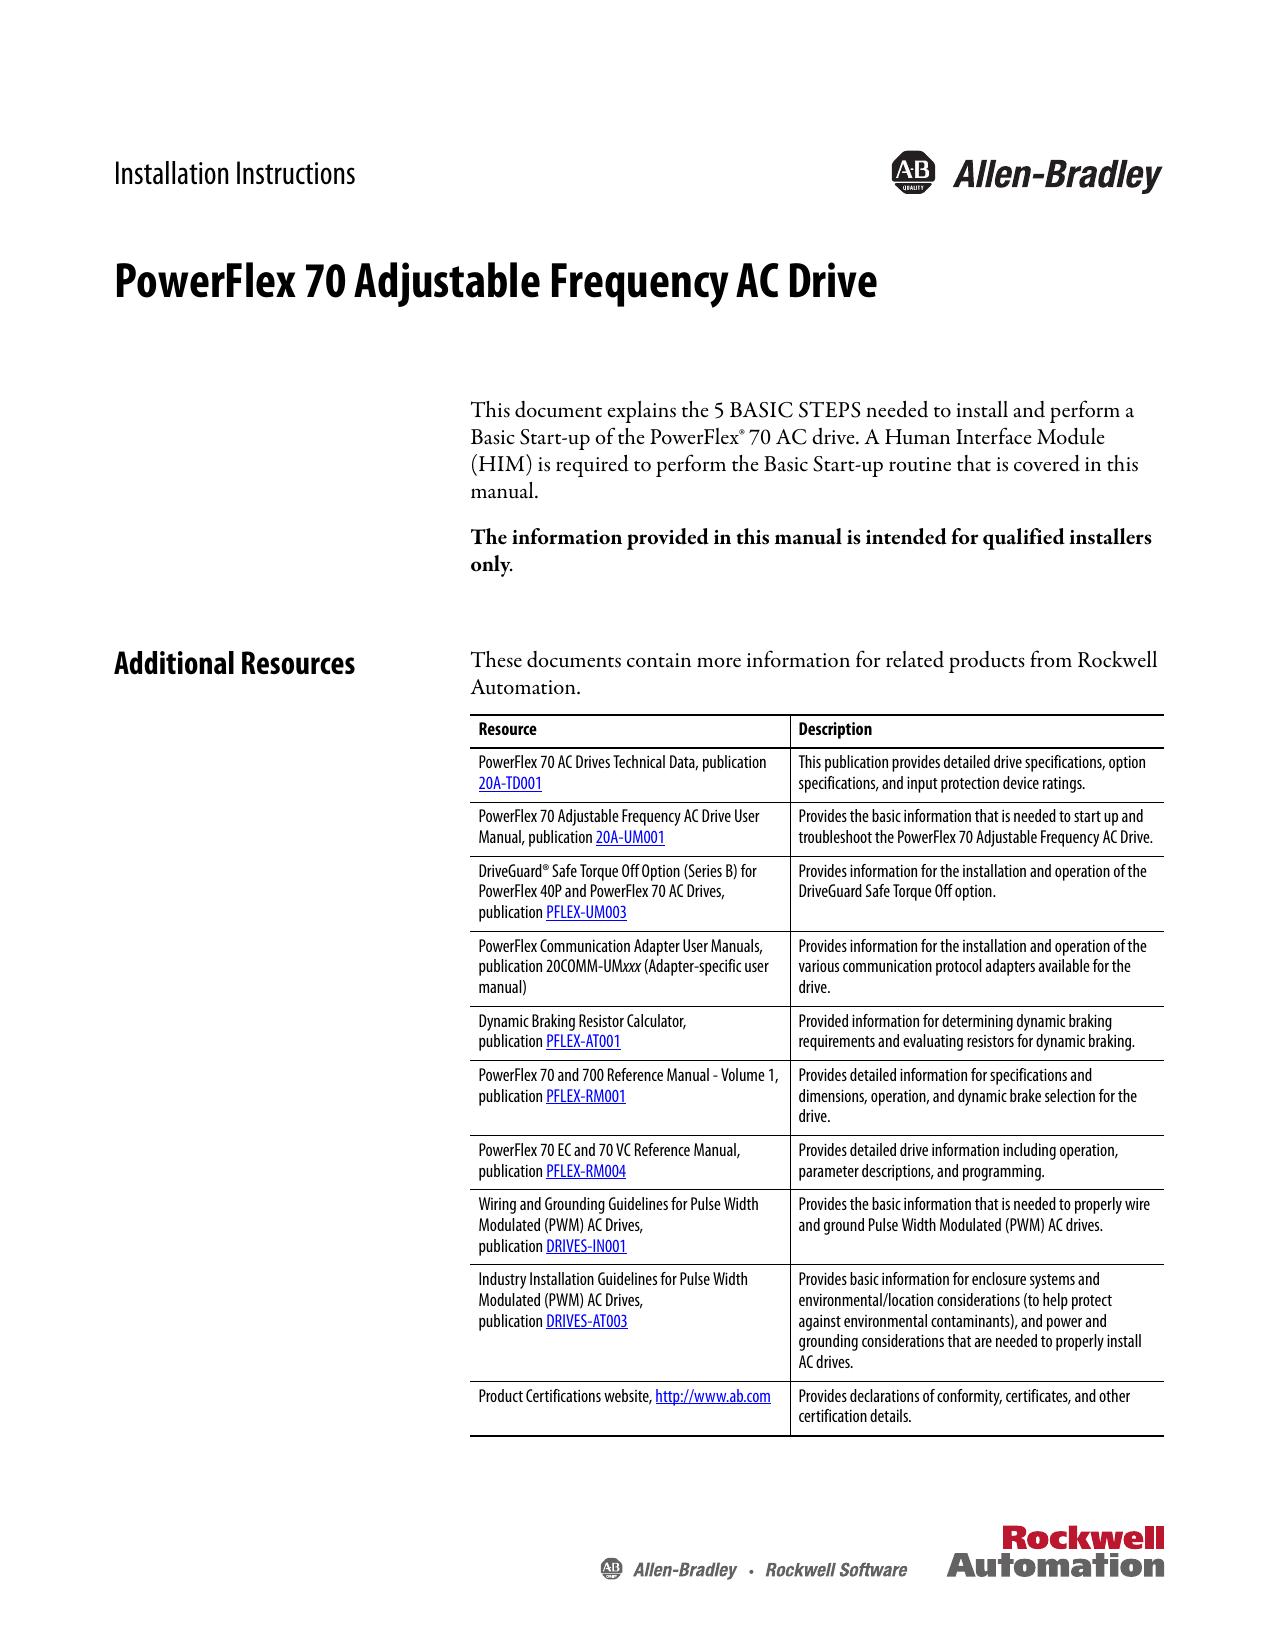 PowerFlex 70 Adjustable Frequency AC Drive Installation